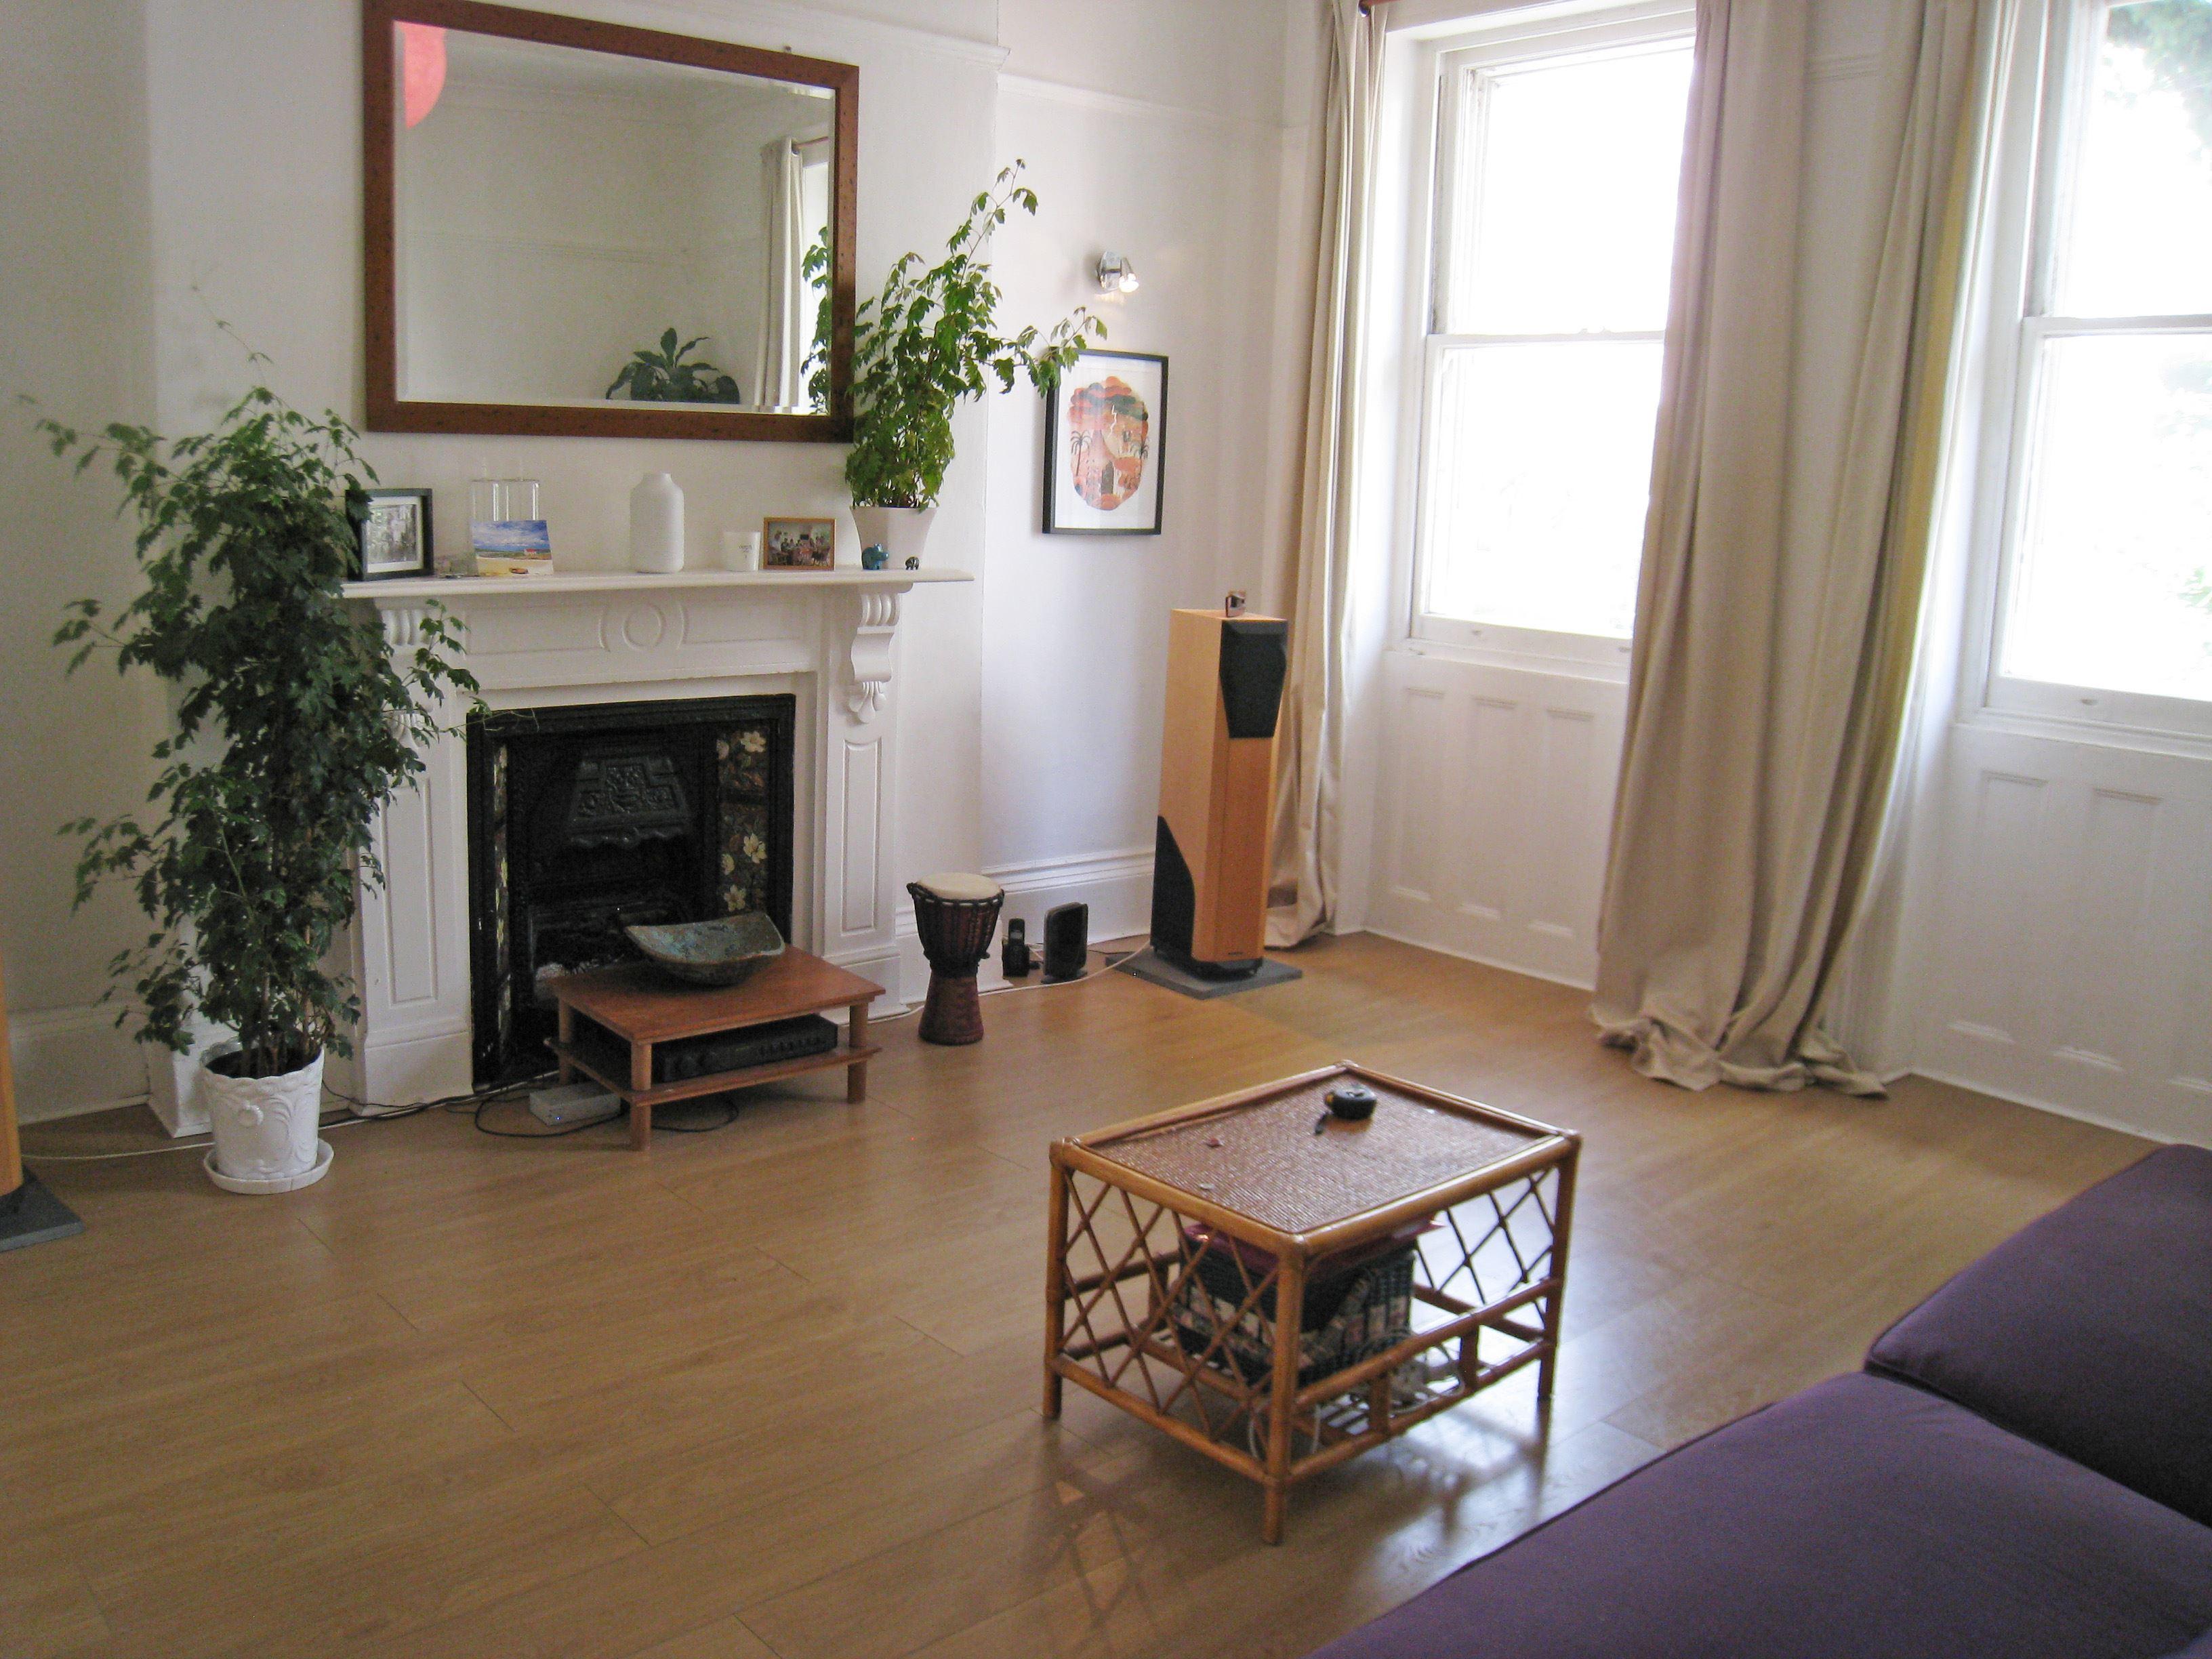 1 Bedroom Flat To Rent Montpelier Road Brighton Bn1 3bd